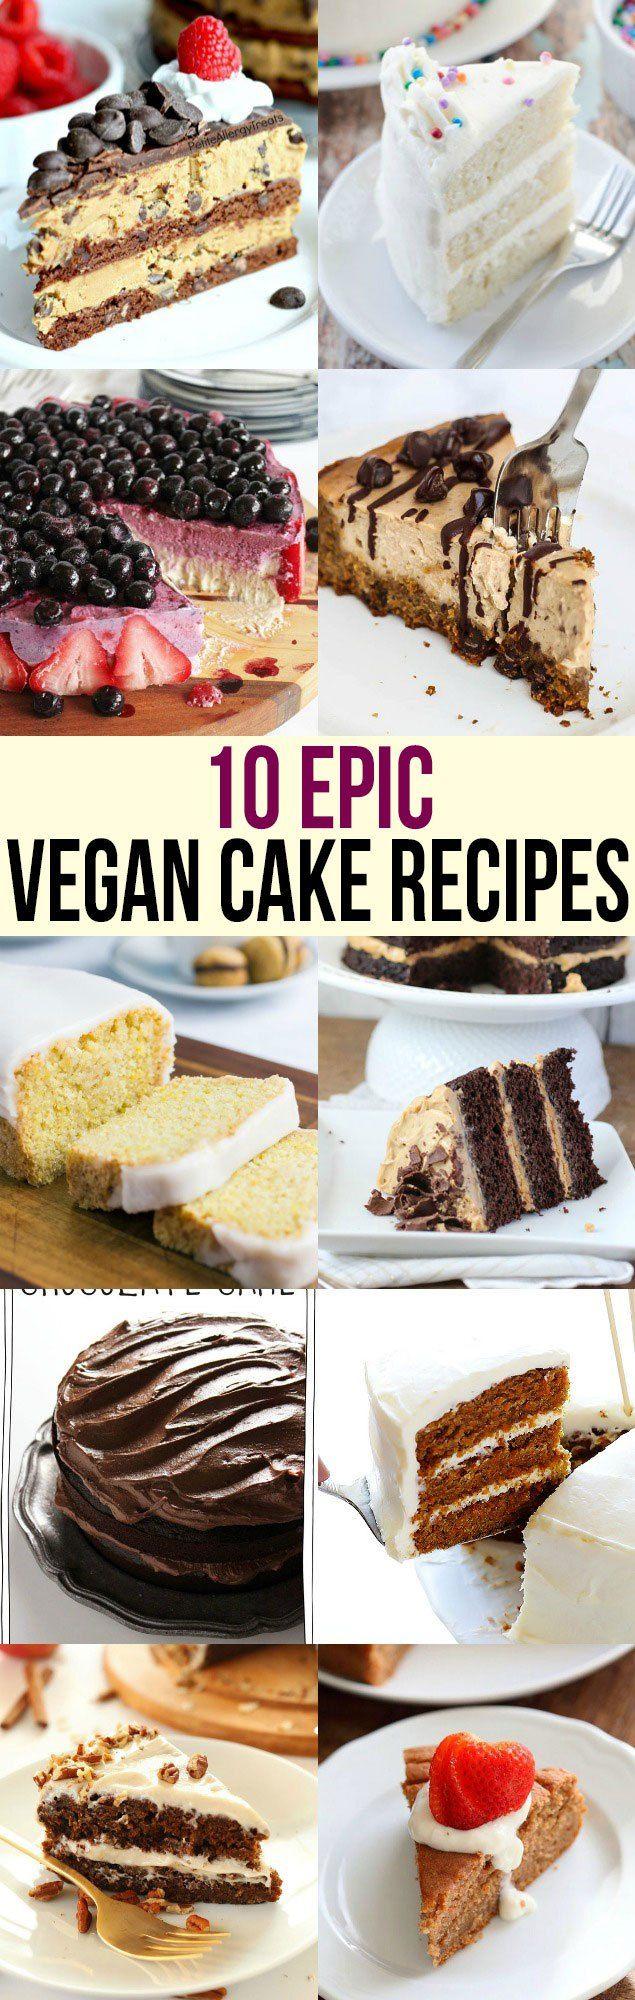 Epic Vegan Cake Recipes ~ Chocolate, cheesecake, strawberry & much more!